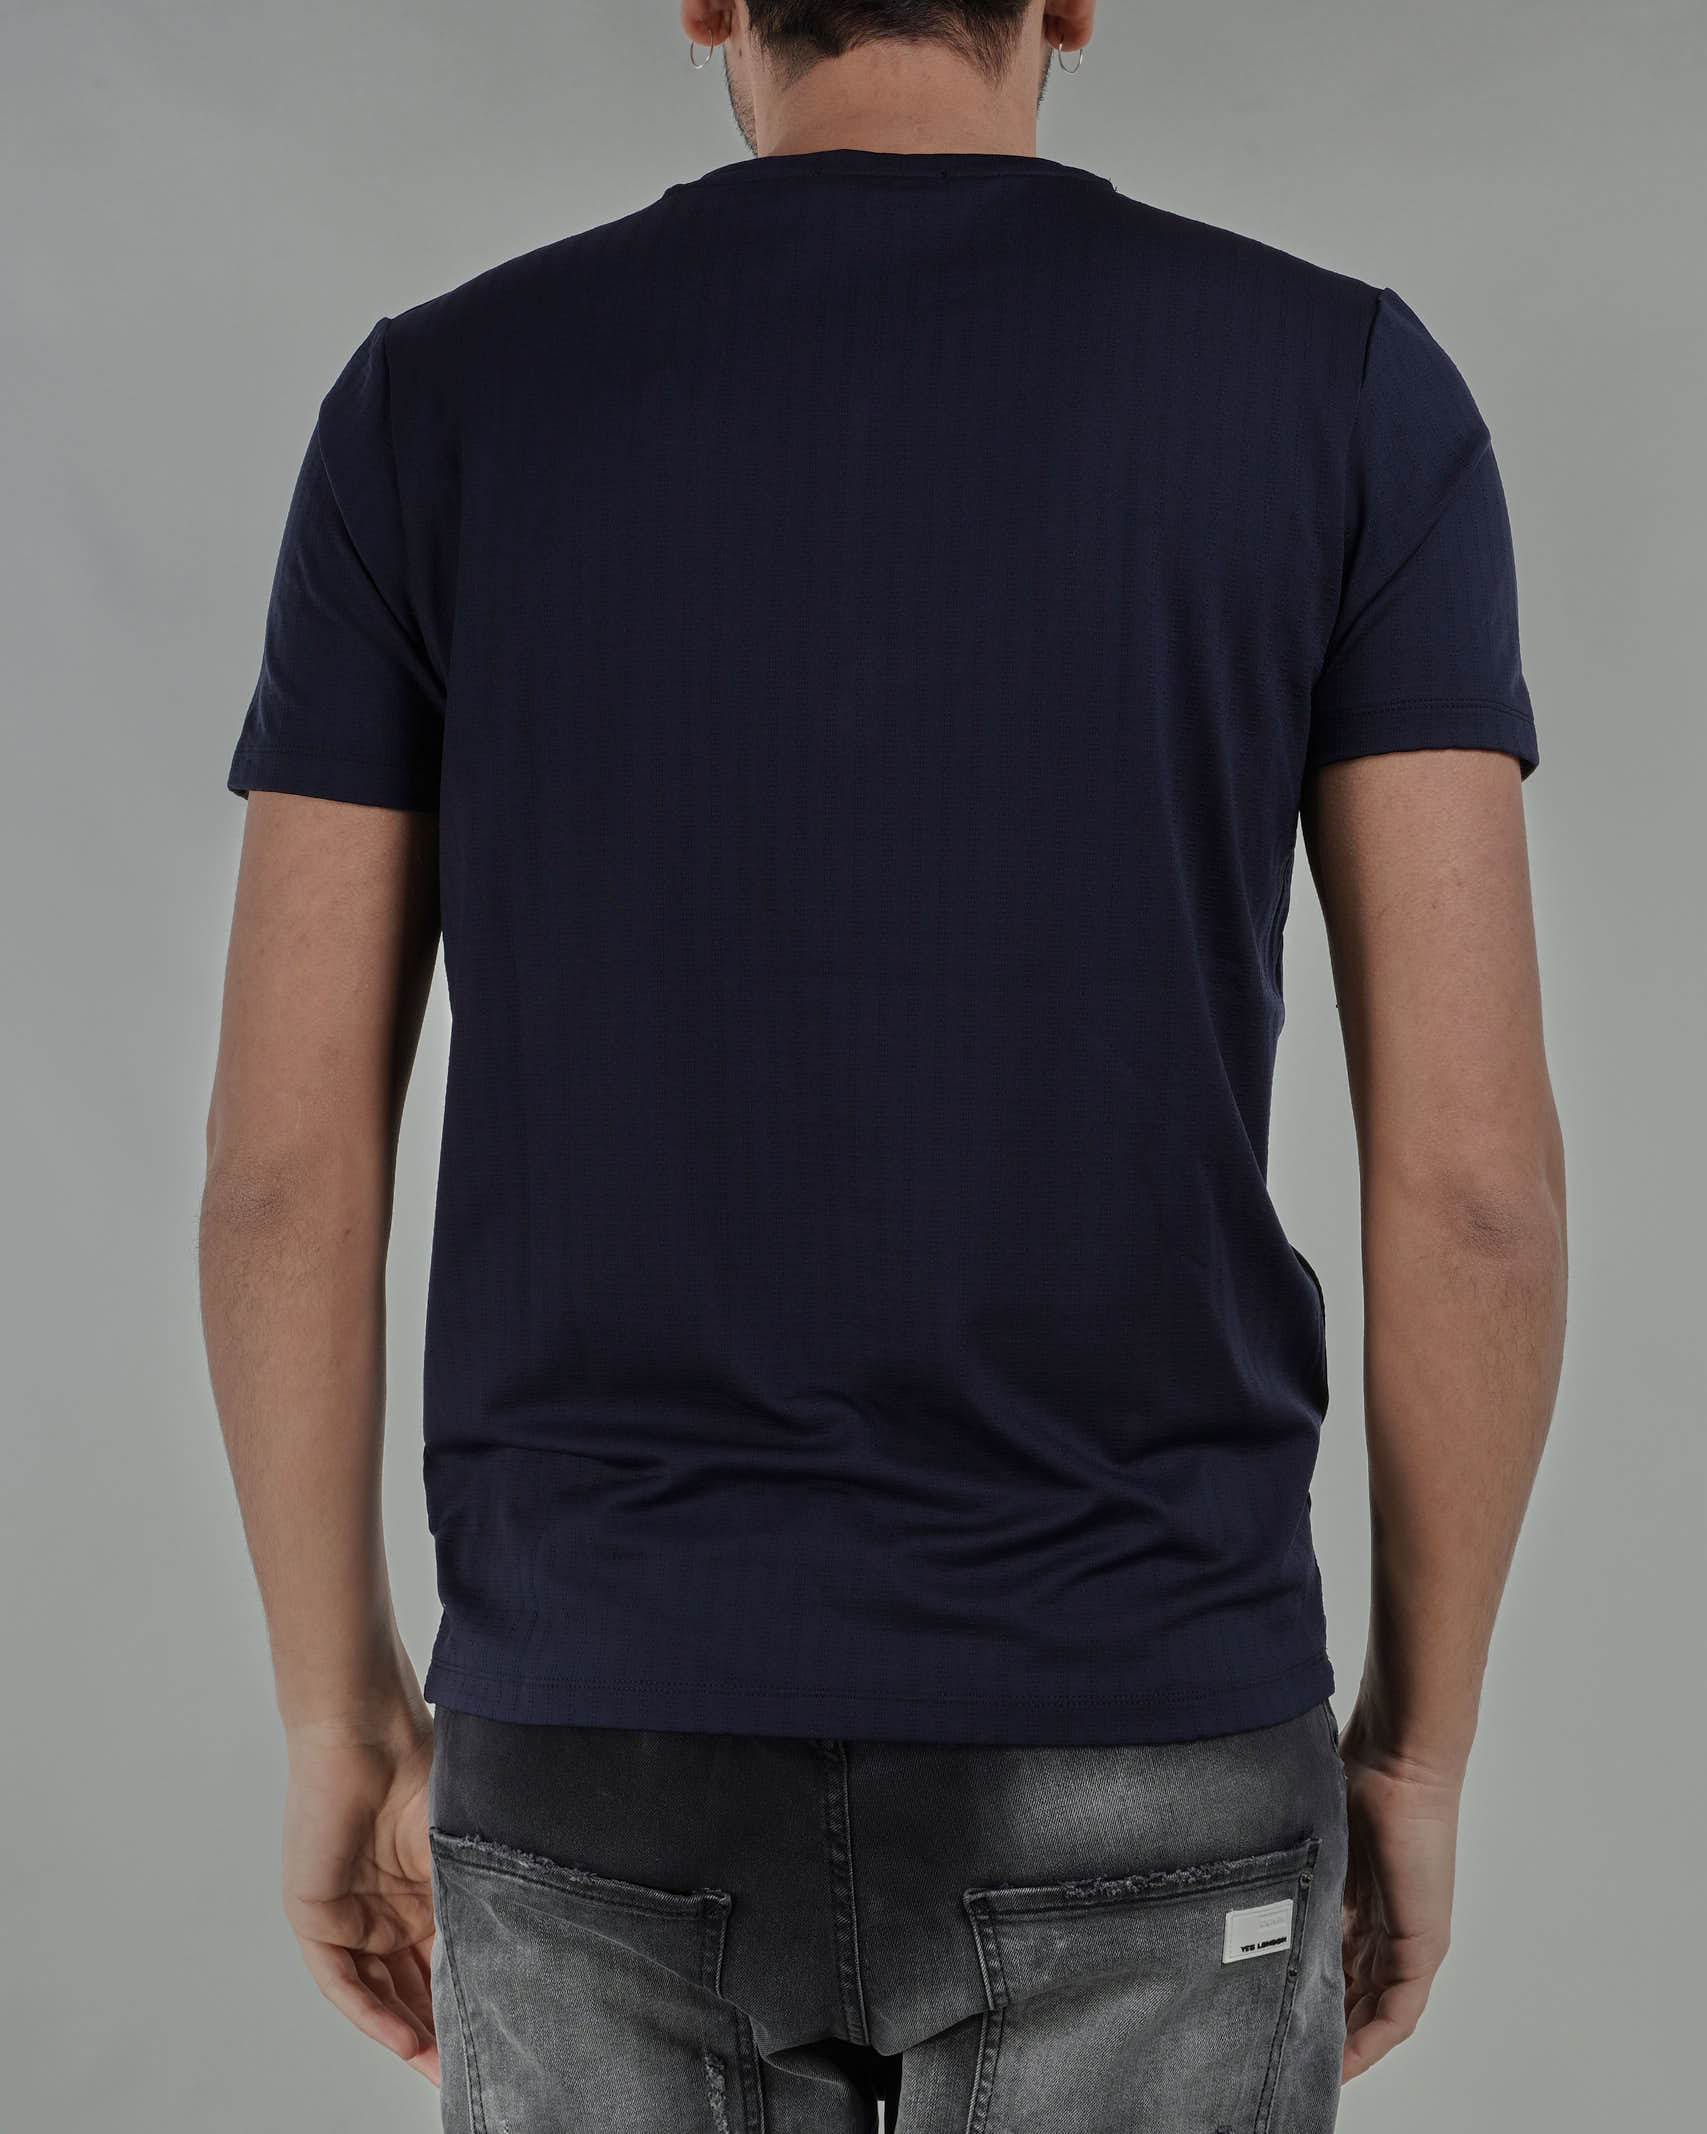 T-shirt in cotone Jeordie's JEORDIE'S   T-shirt   77110400